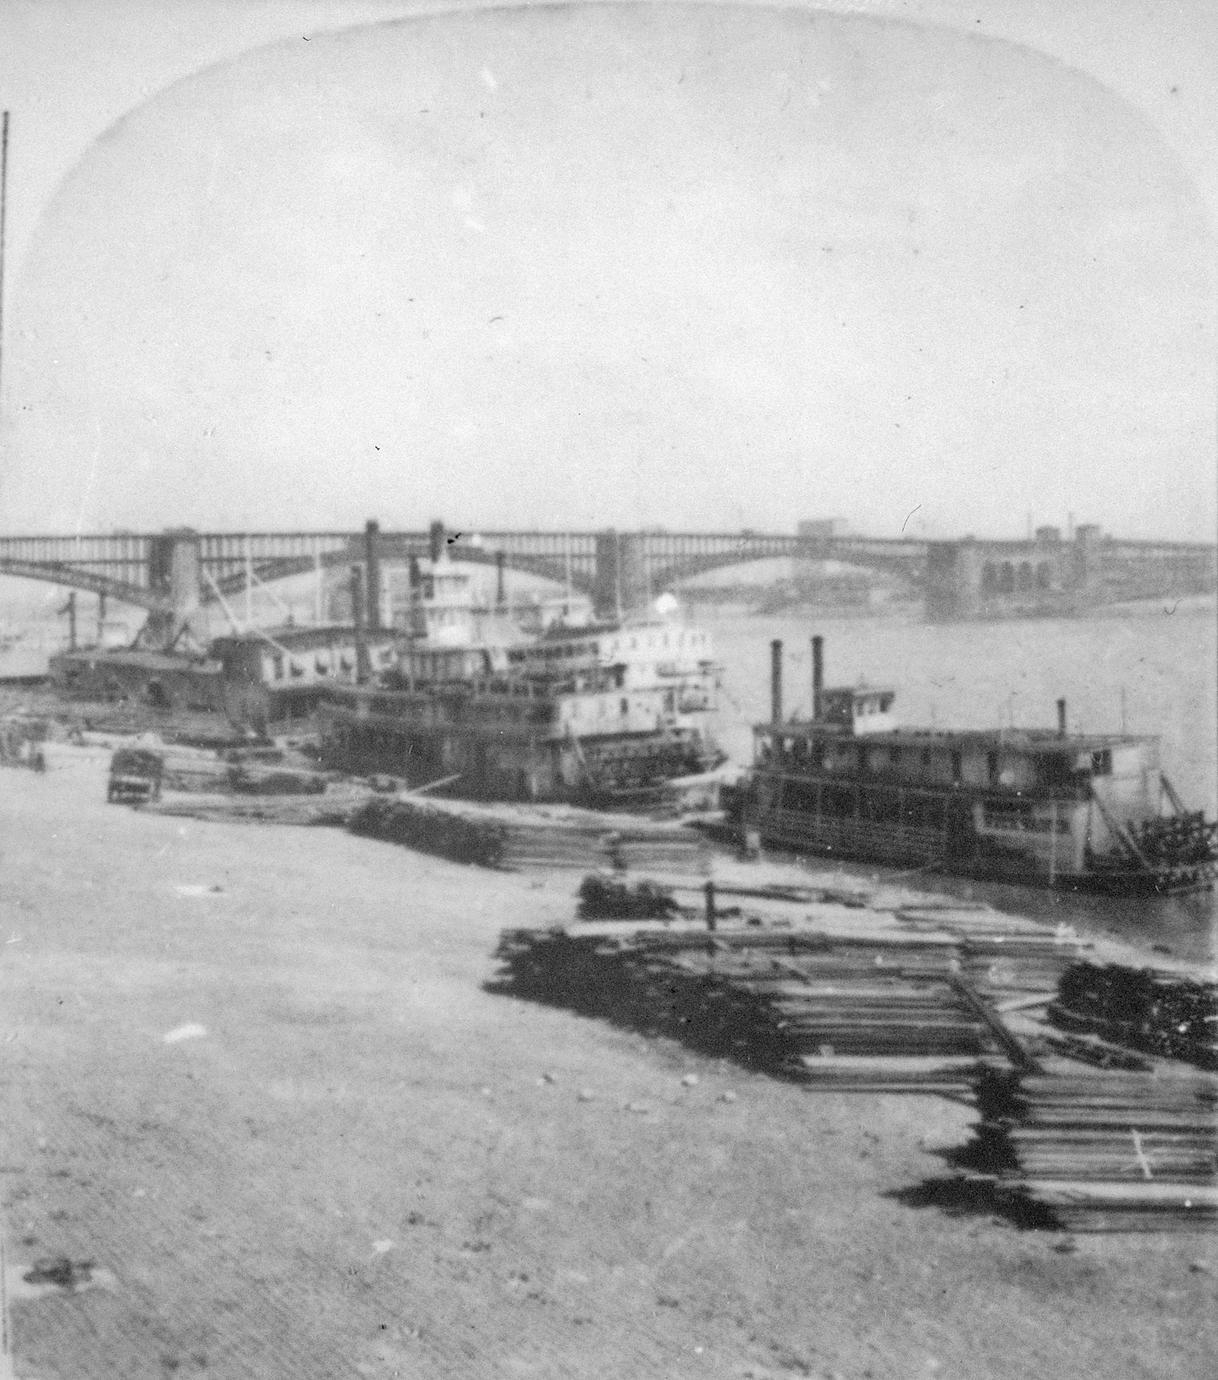 Nick Sauer (Towboat, 1882-?)